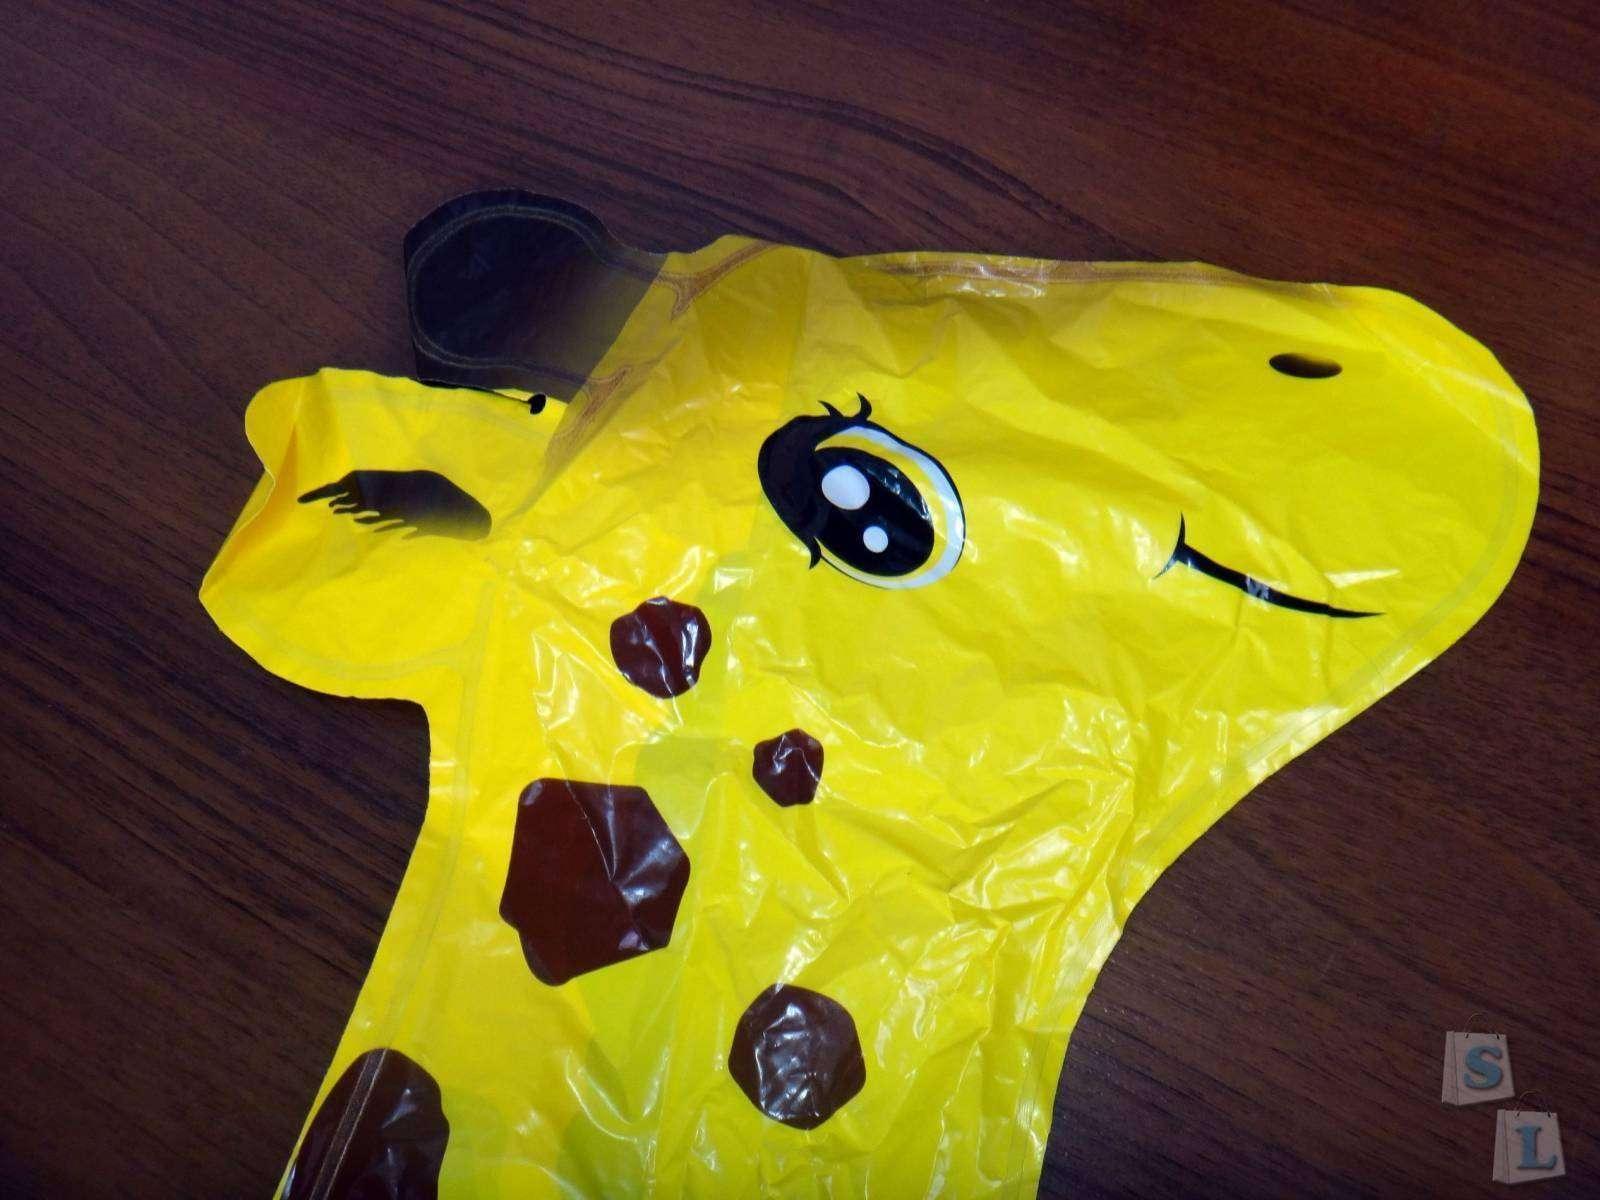 GearBest: Большие надувные шарики от Gearbest - Миньон, шар жираф и цифры